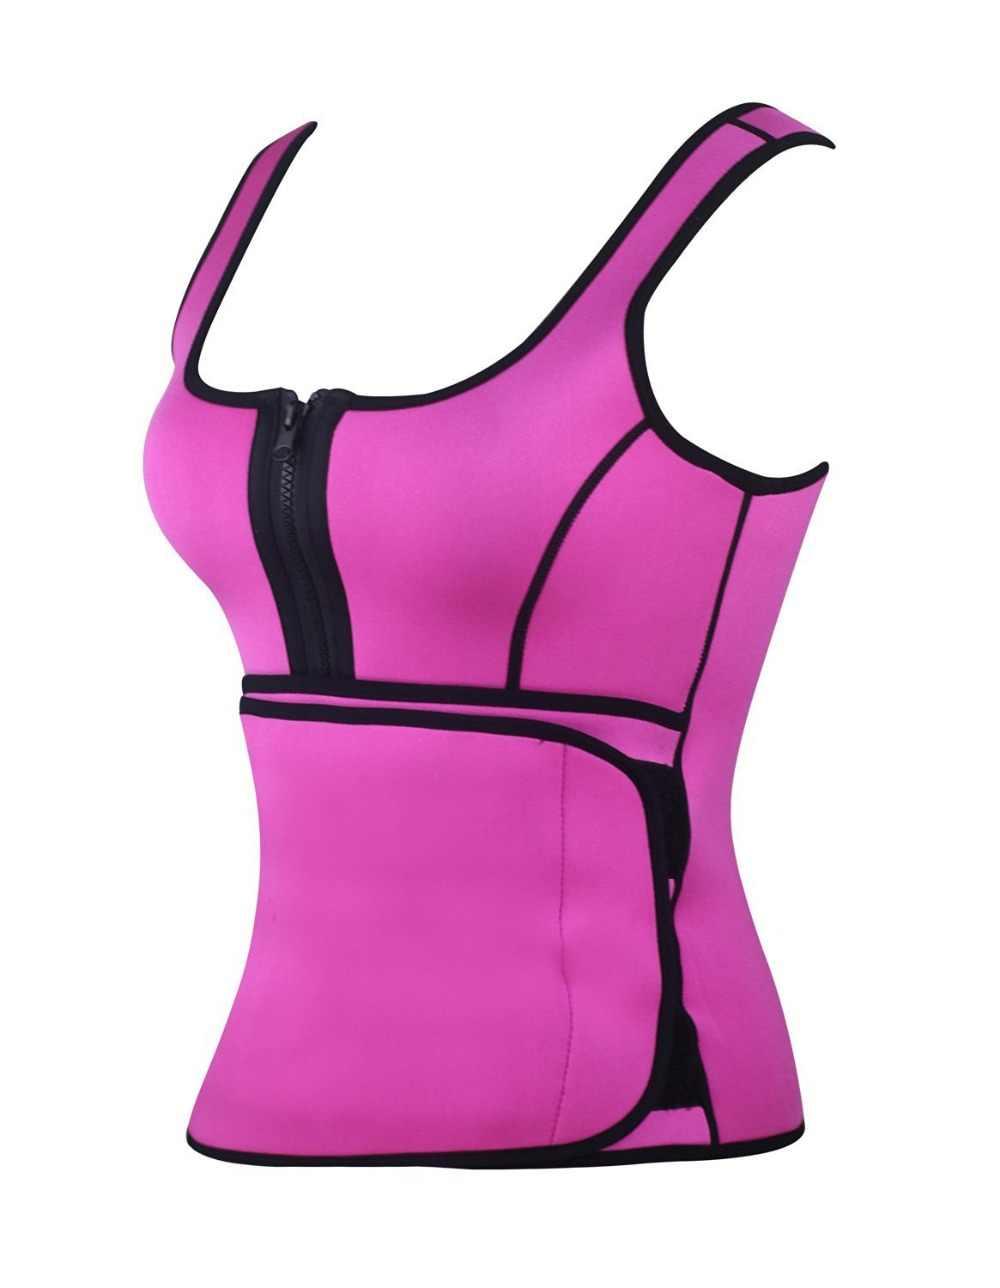 4777781e893 ... Neoprene Sauna Waist Trainer Vest Hot Shaper Summer Workout Shaperwear Slimming  Adjustable Sweat Belt Fajas Body ...